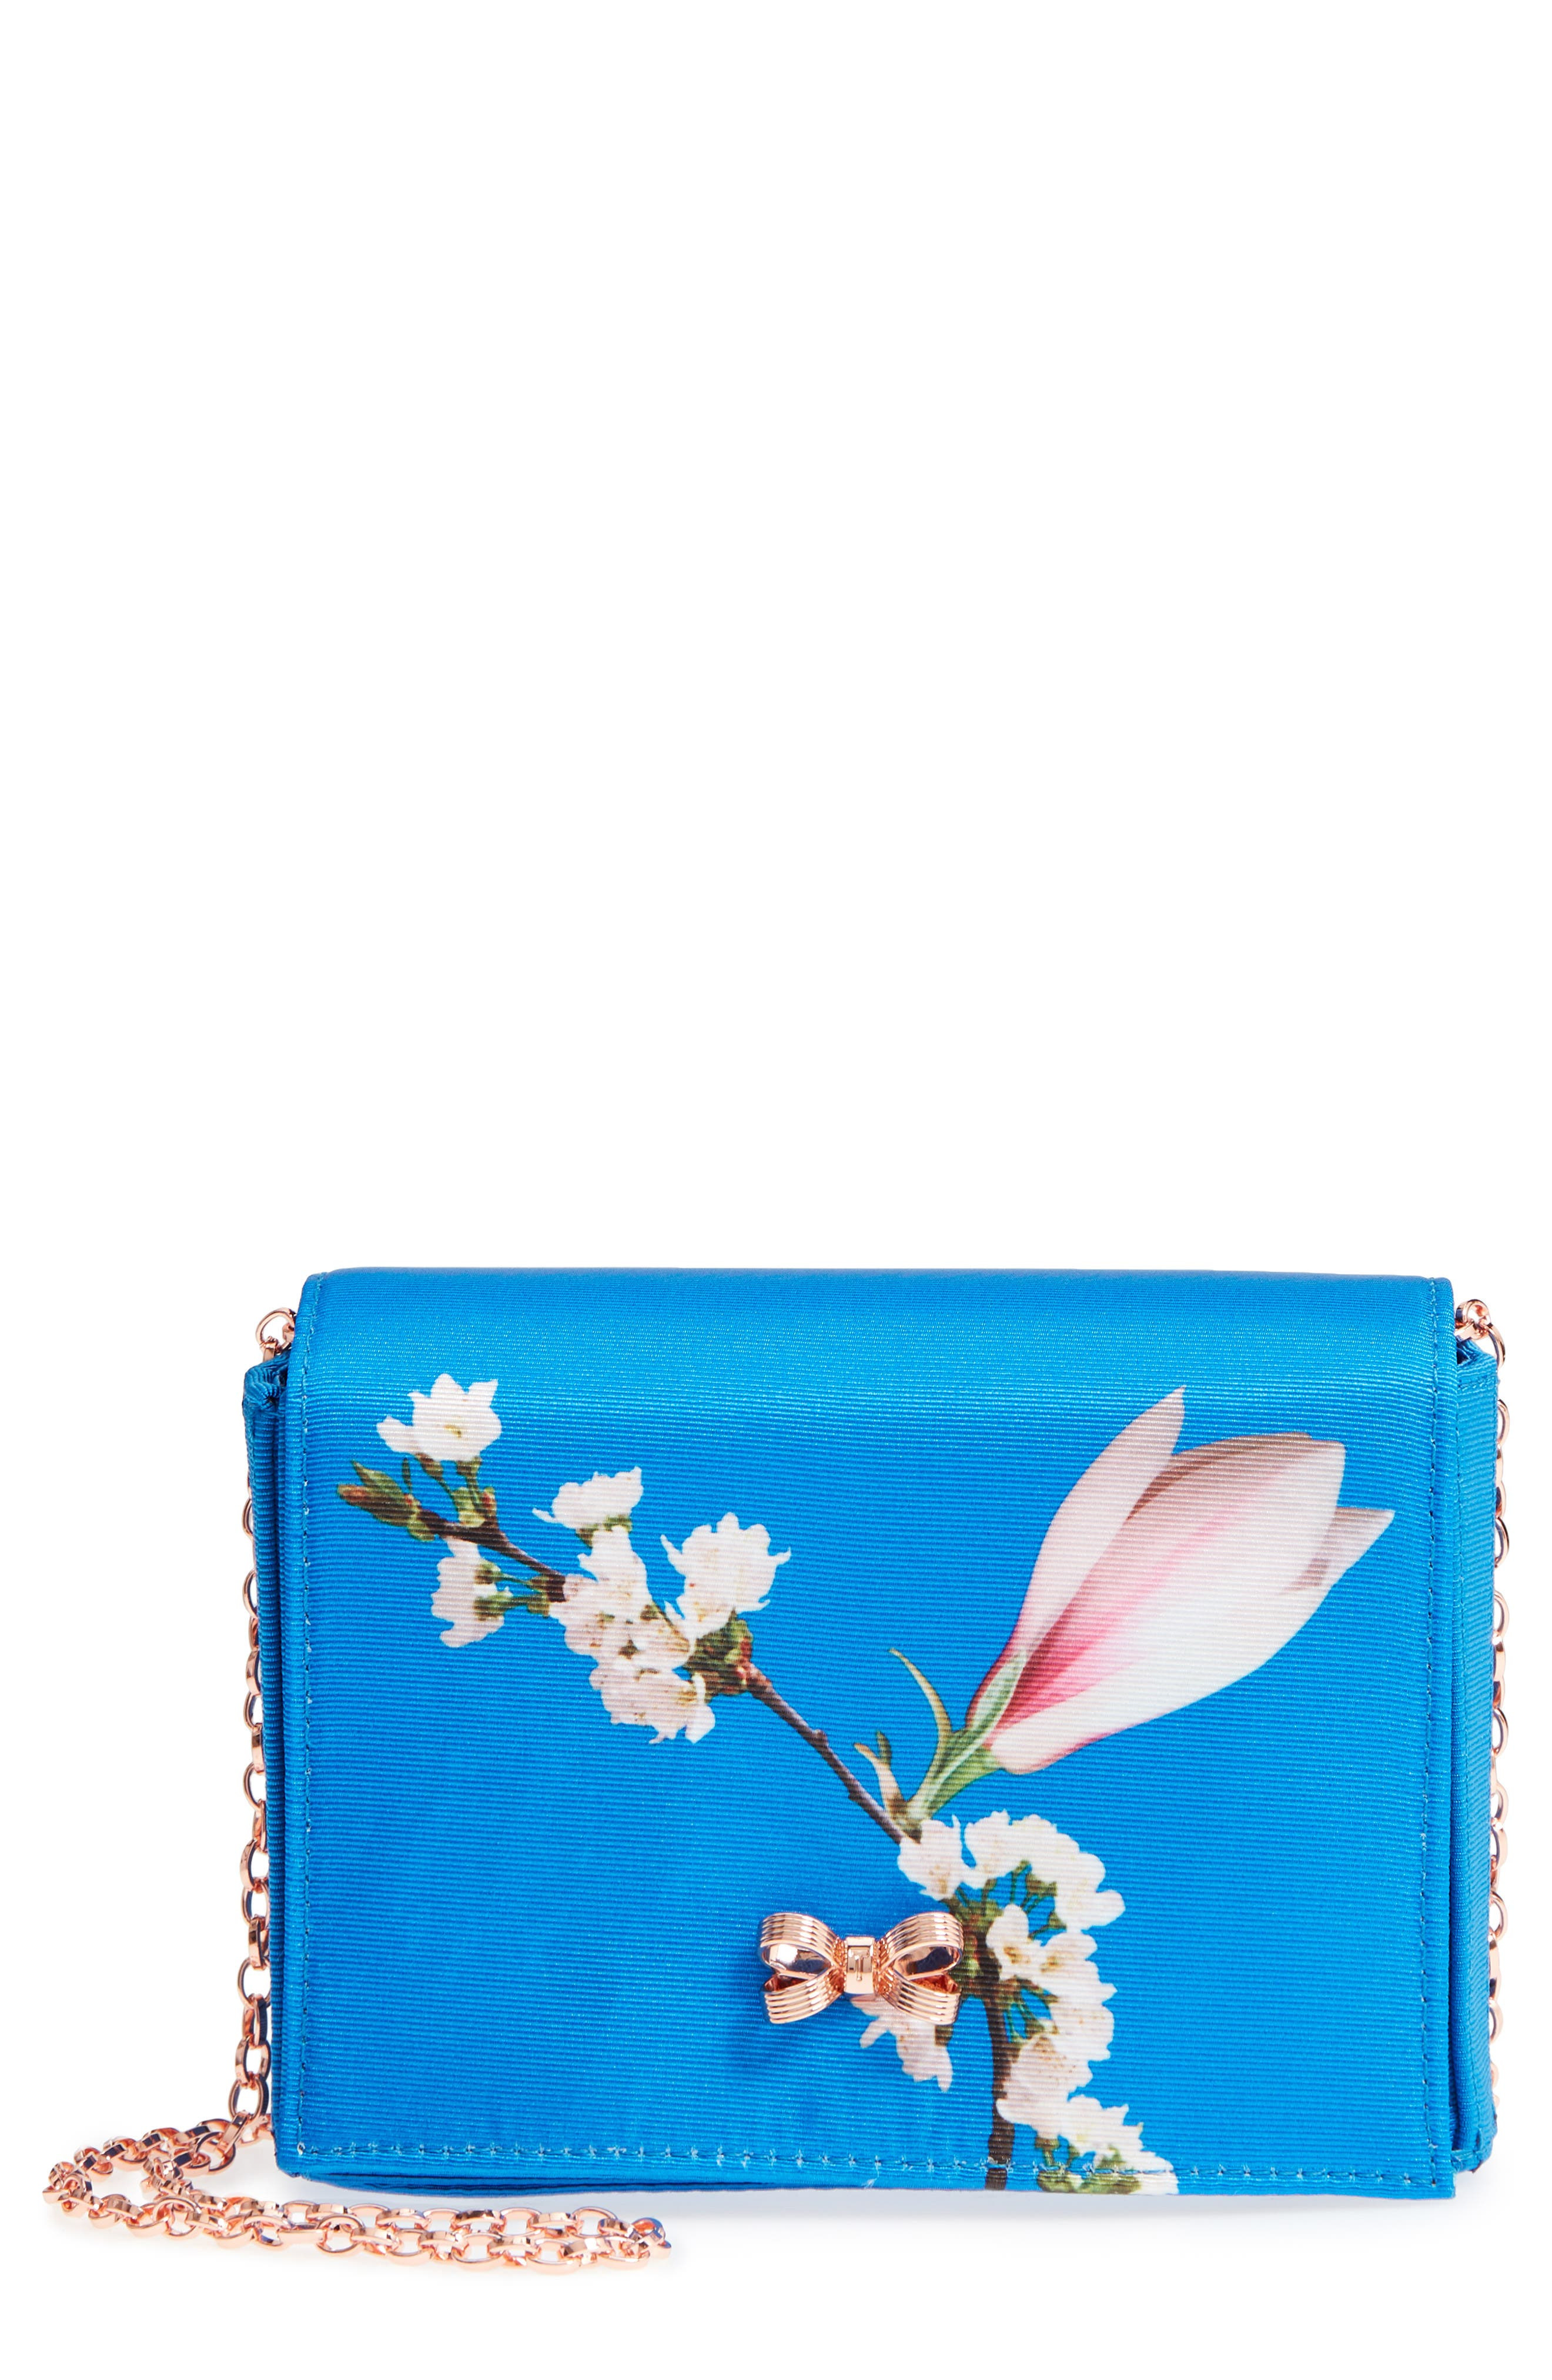 Harmony Print Evening Bag,                             Main thumbnail 1, color,                             Bright Blue